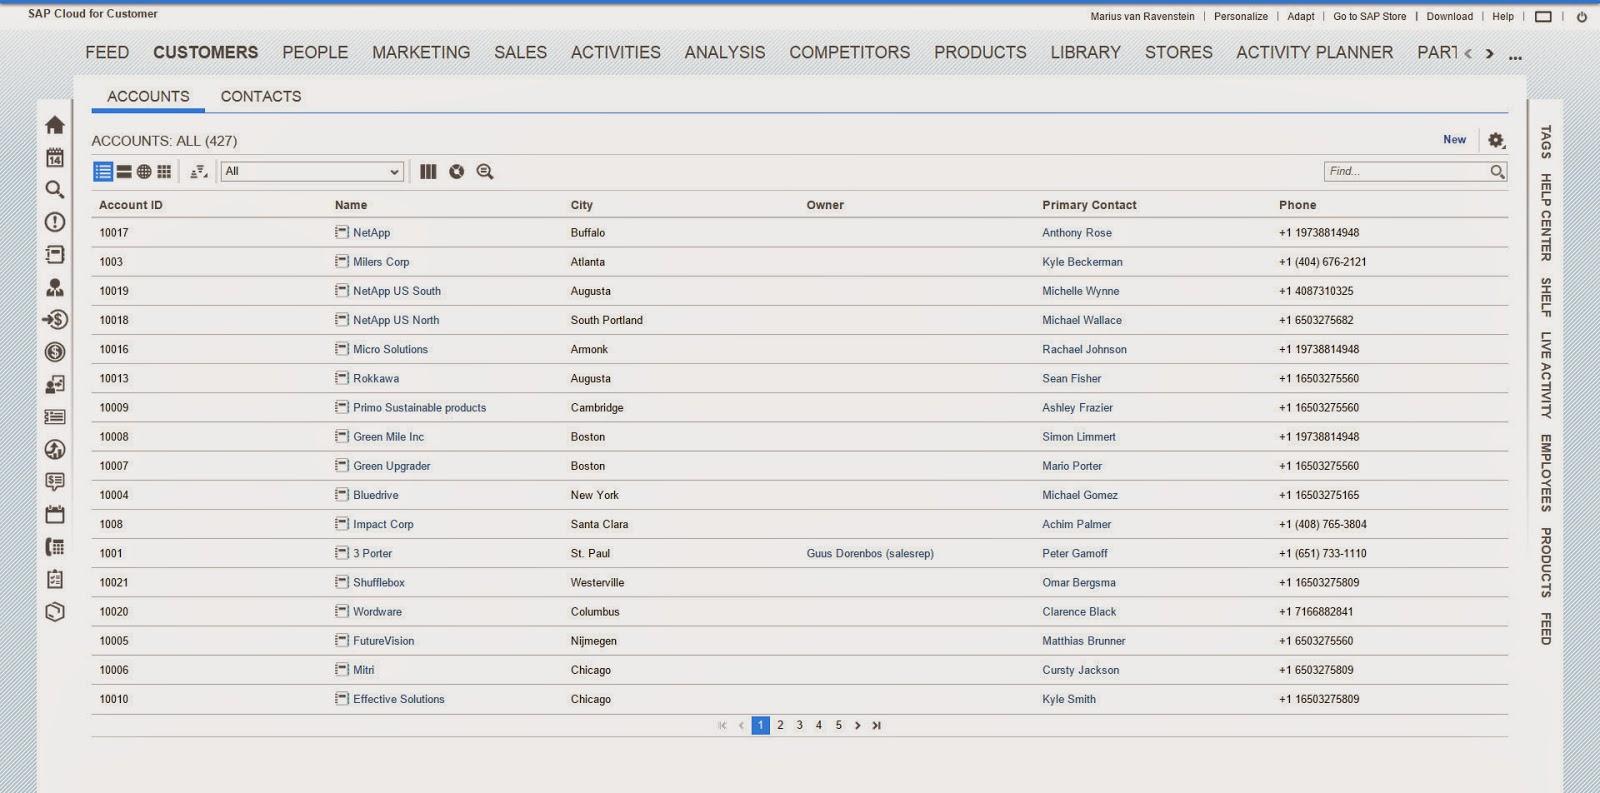 Sap Cloud For Customer Fiori User Interface New Ipad App